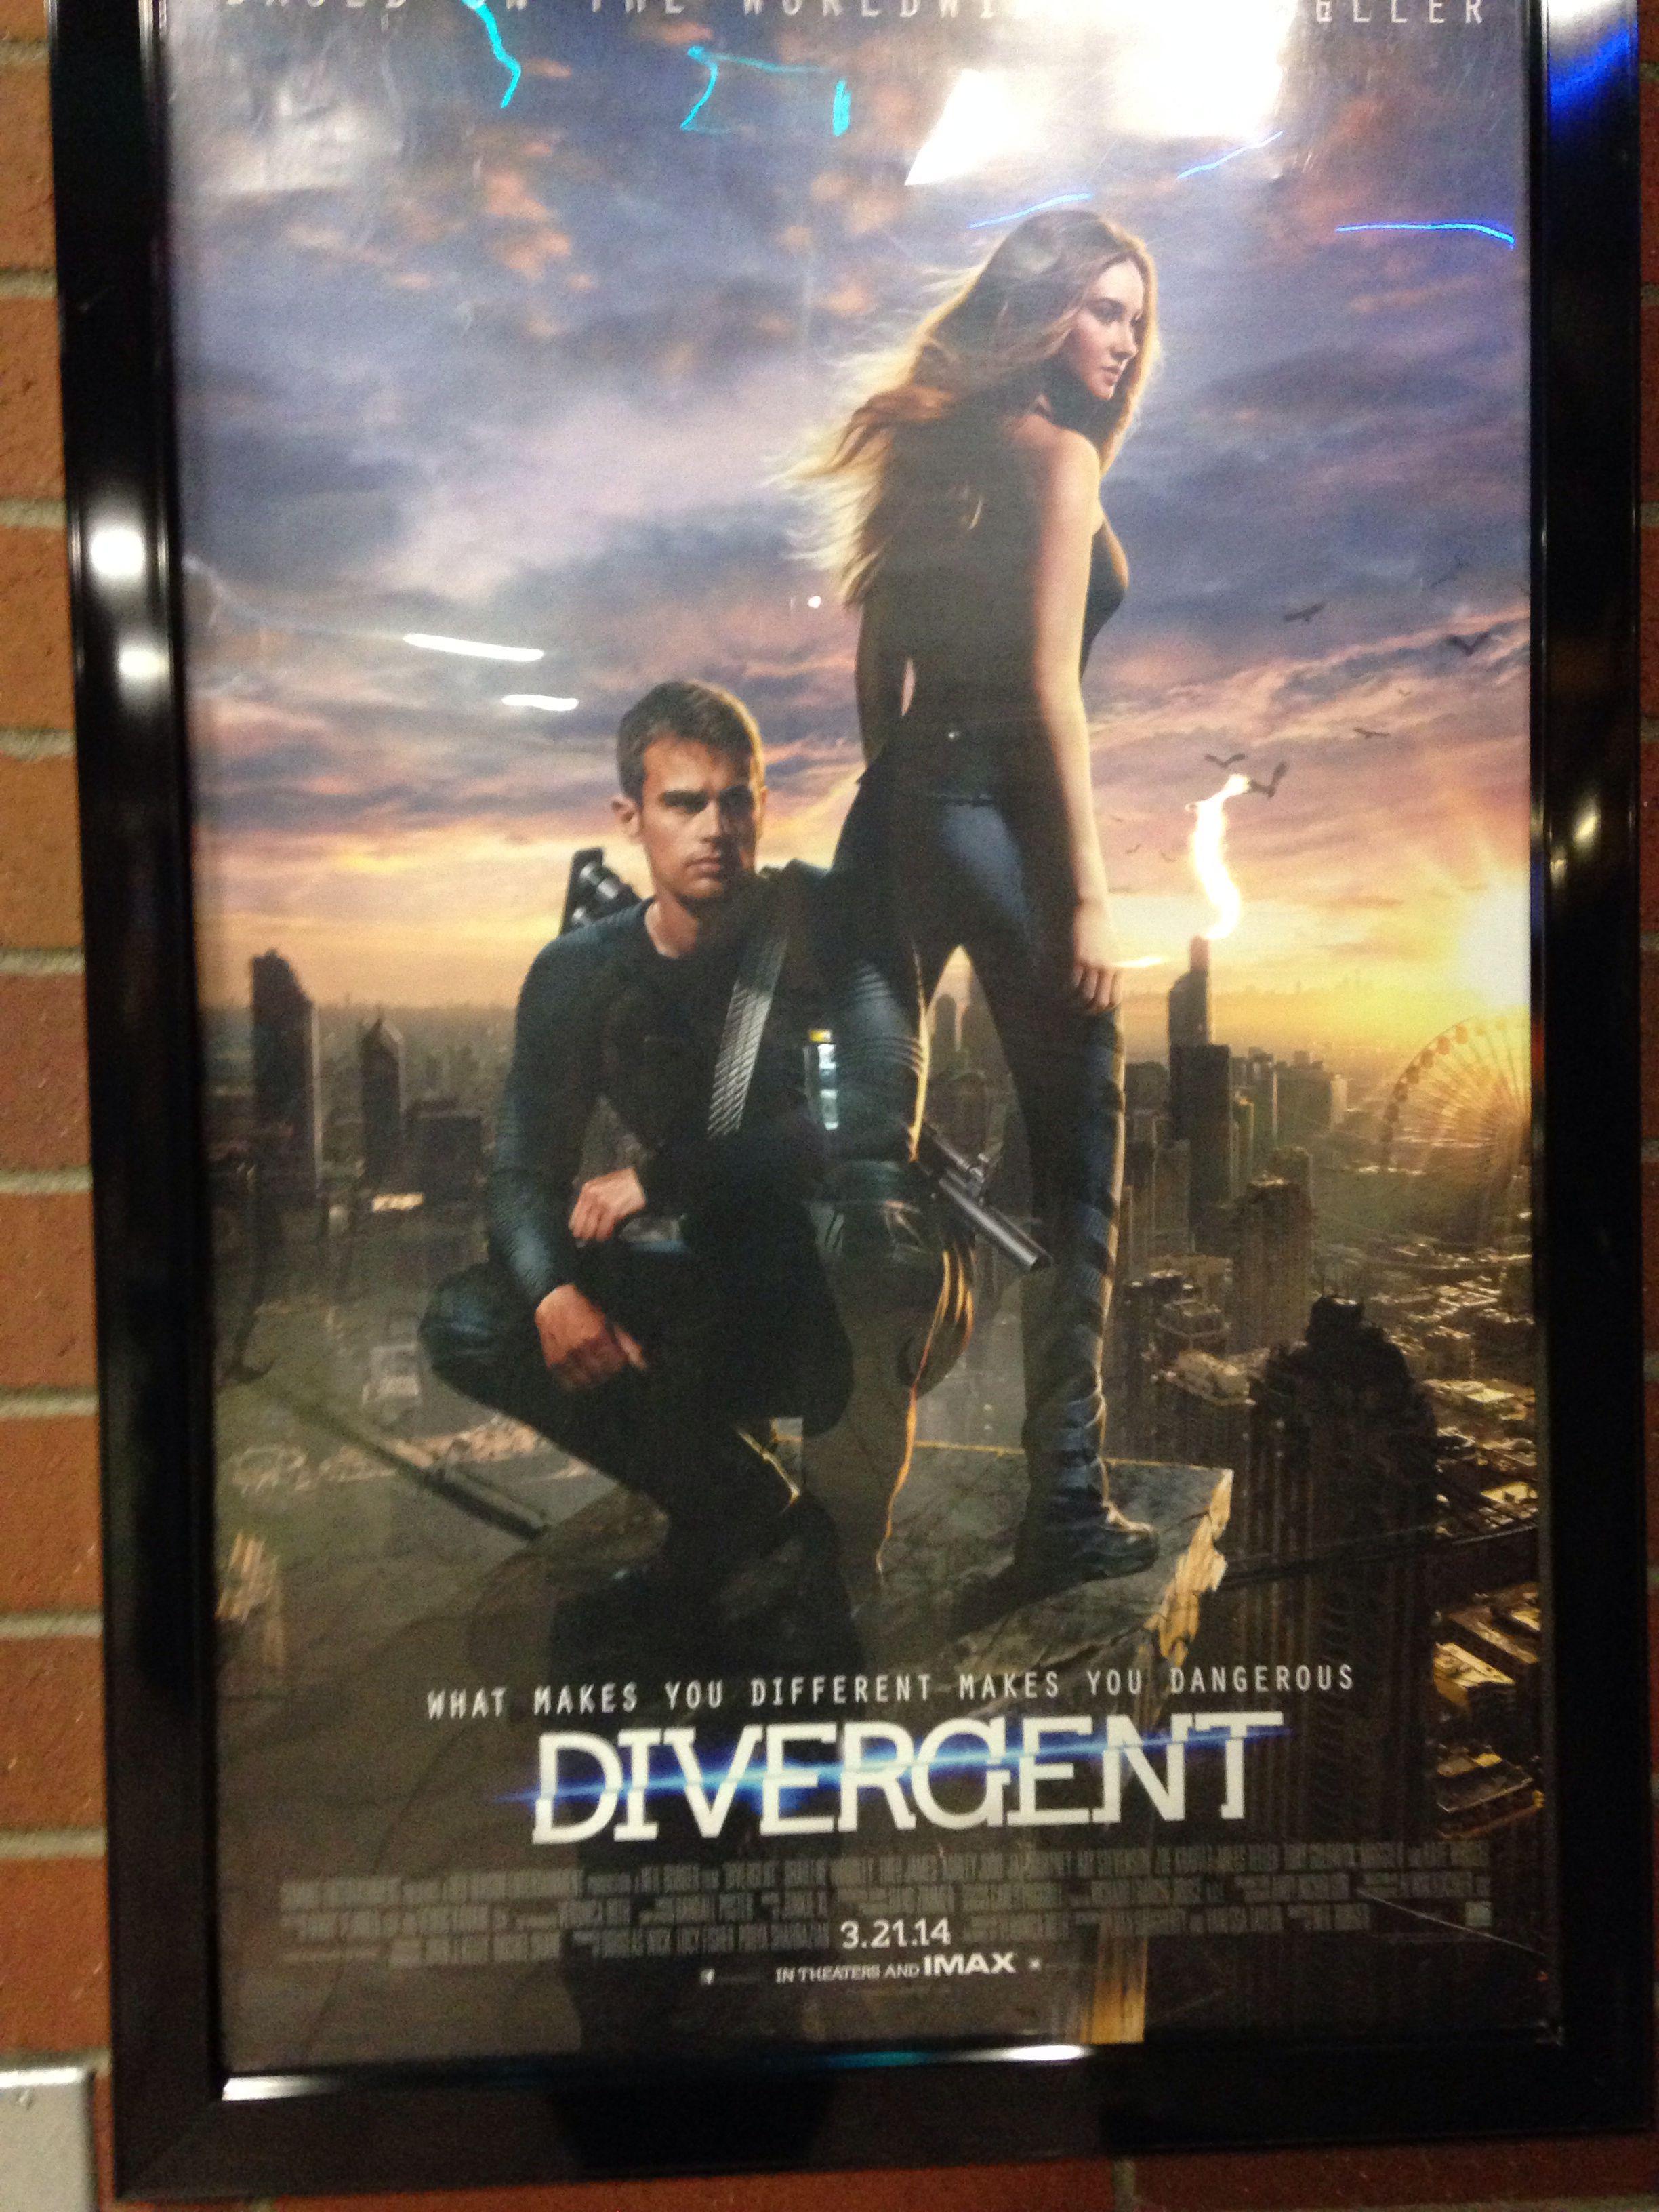 Divergent divergent trilogy divergent imax